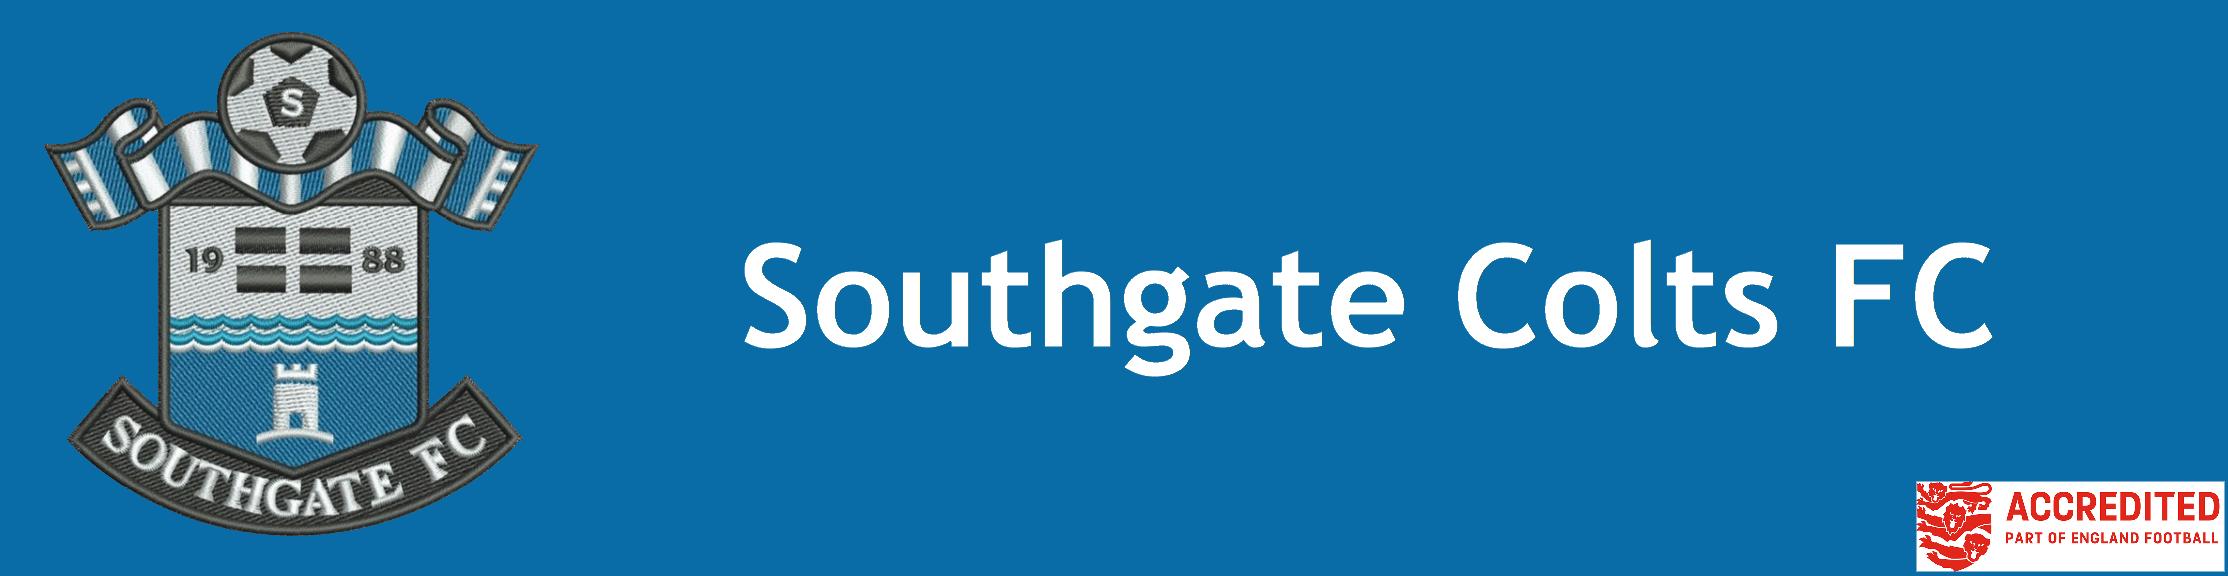 Southgate Colts FC